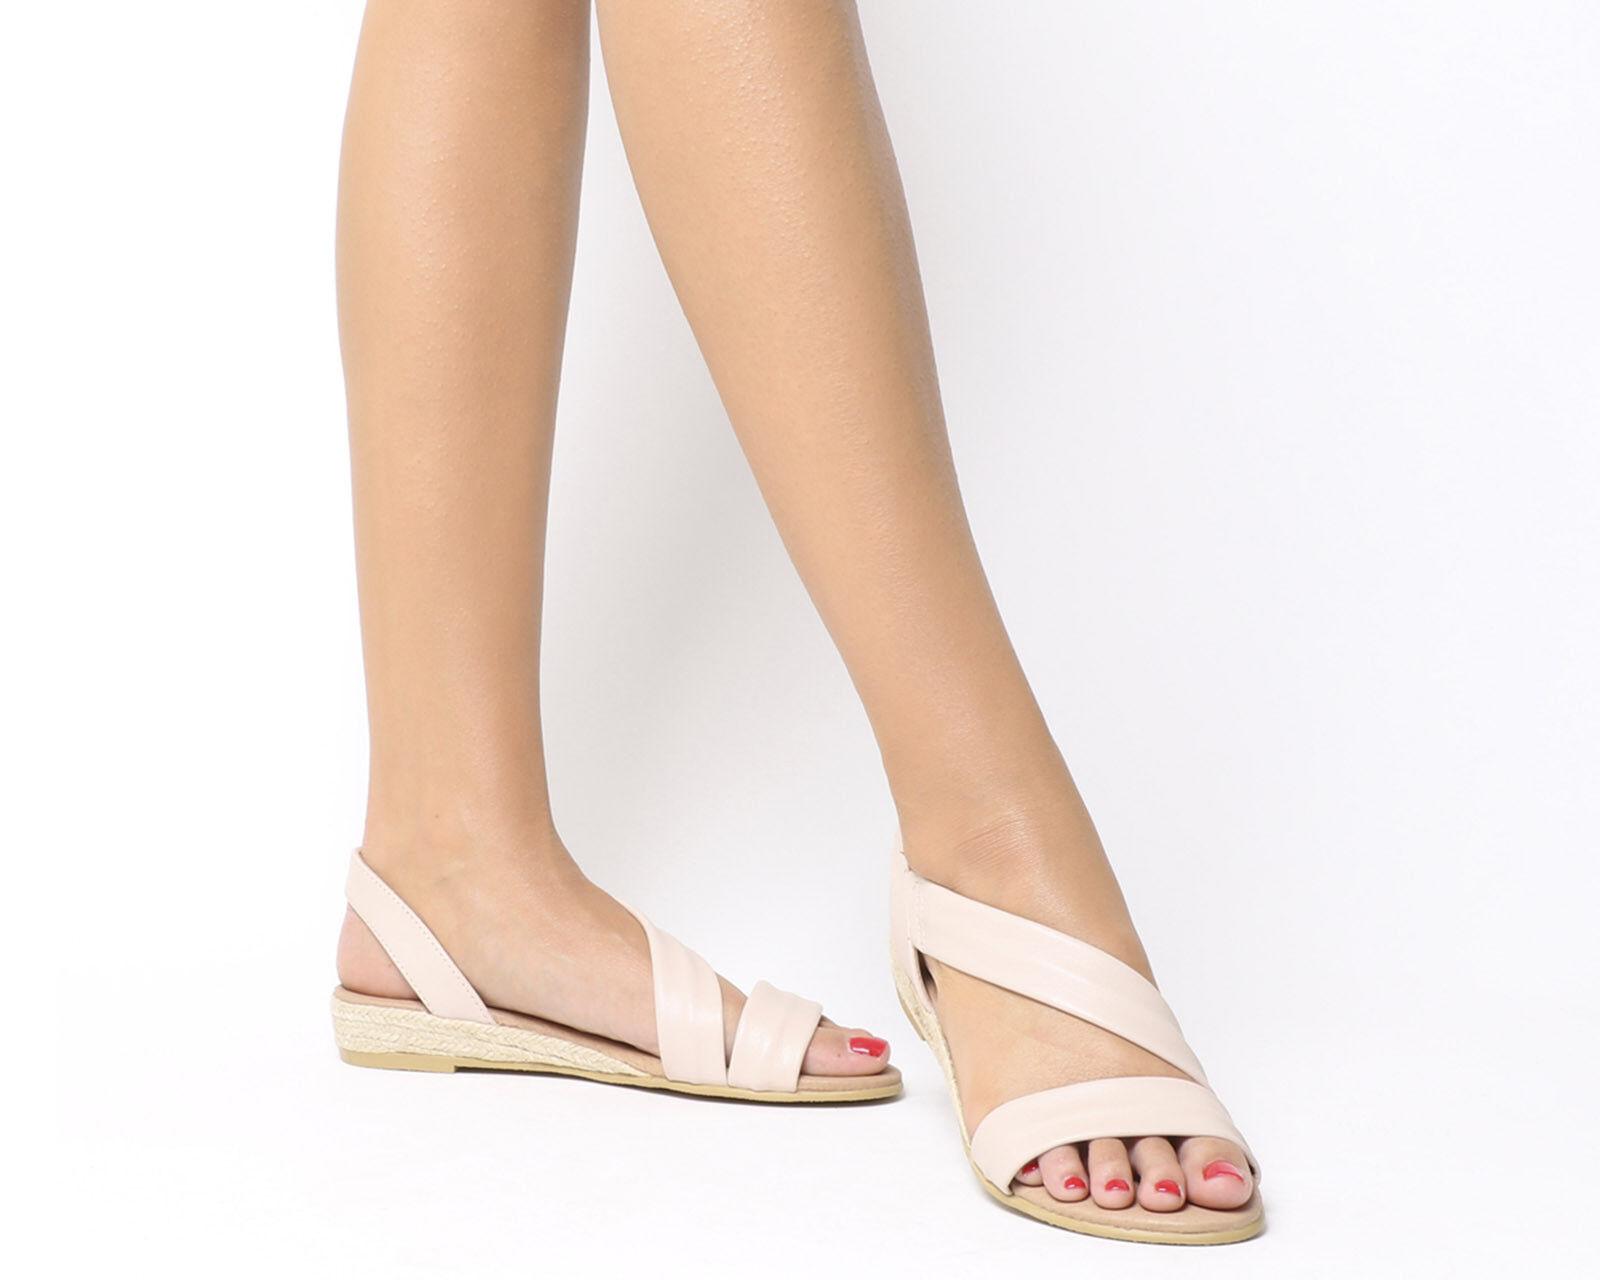 Último gran descuento Womens Office Heidi Espadrille Sandals NUDE LEATHER Sandals